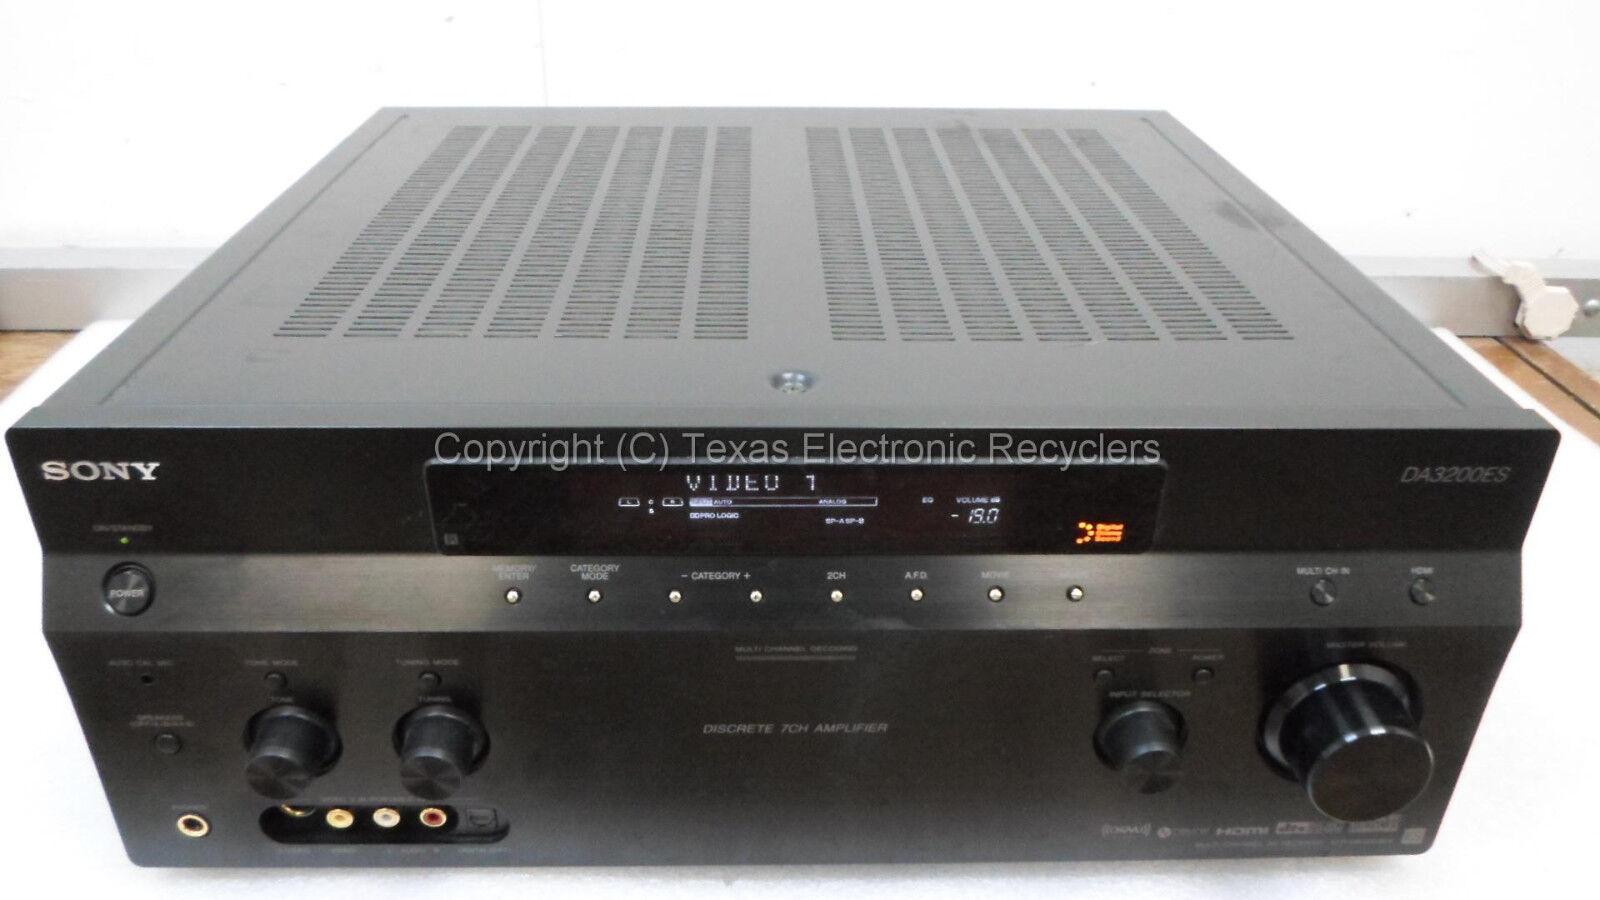 PARTS OR REPAIR - Sony DA3200ES STR-DA3200ES Multi Channel AV Receiver